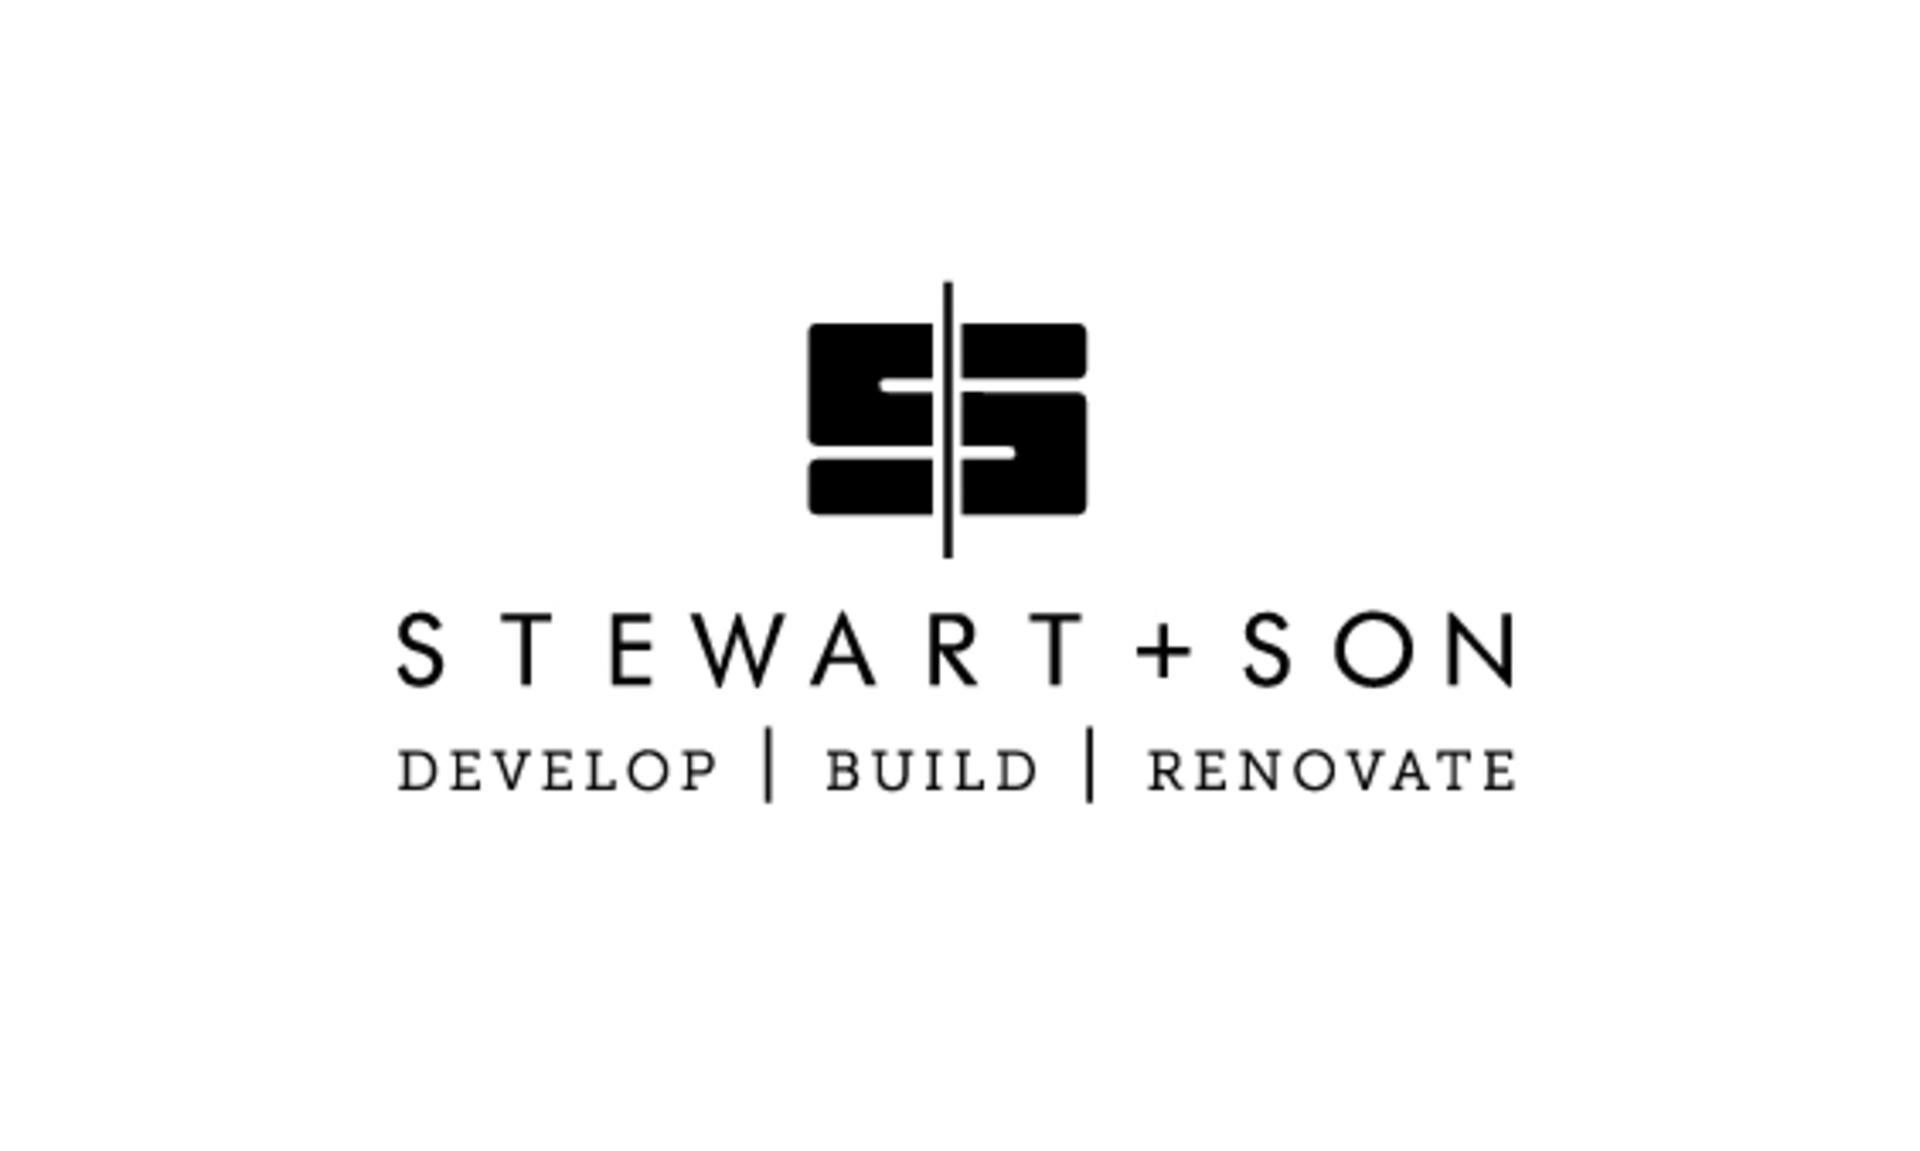 Stewart + Son Homes